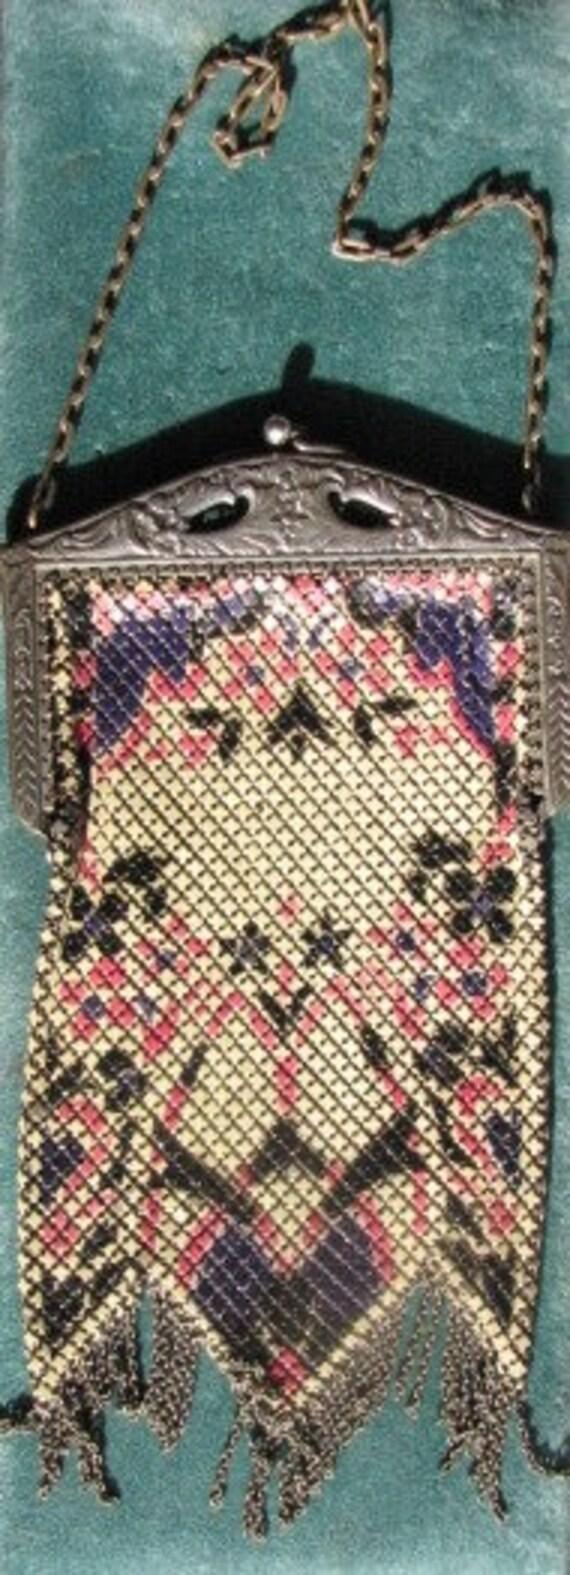 Antique Signed Mandalian Mesh Evening Bag